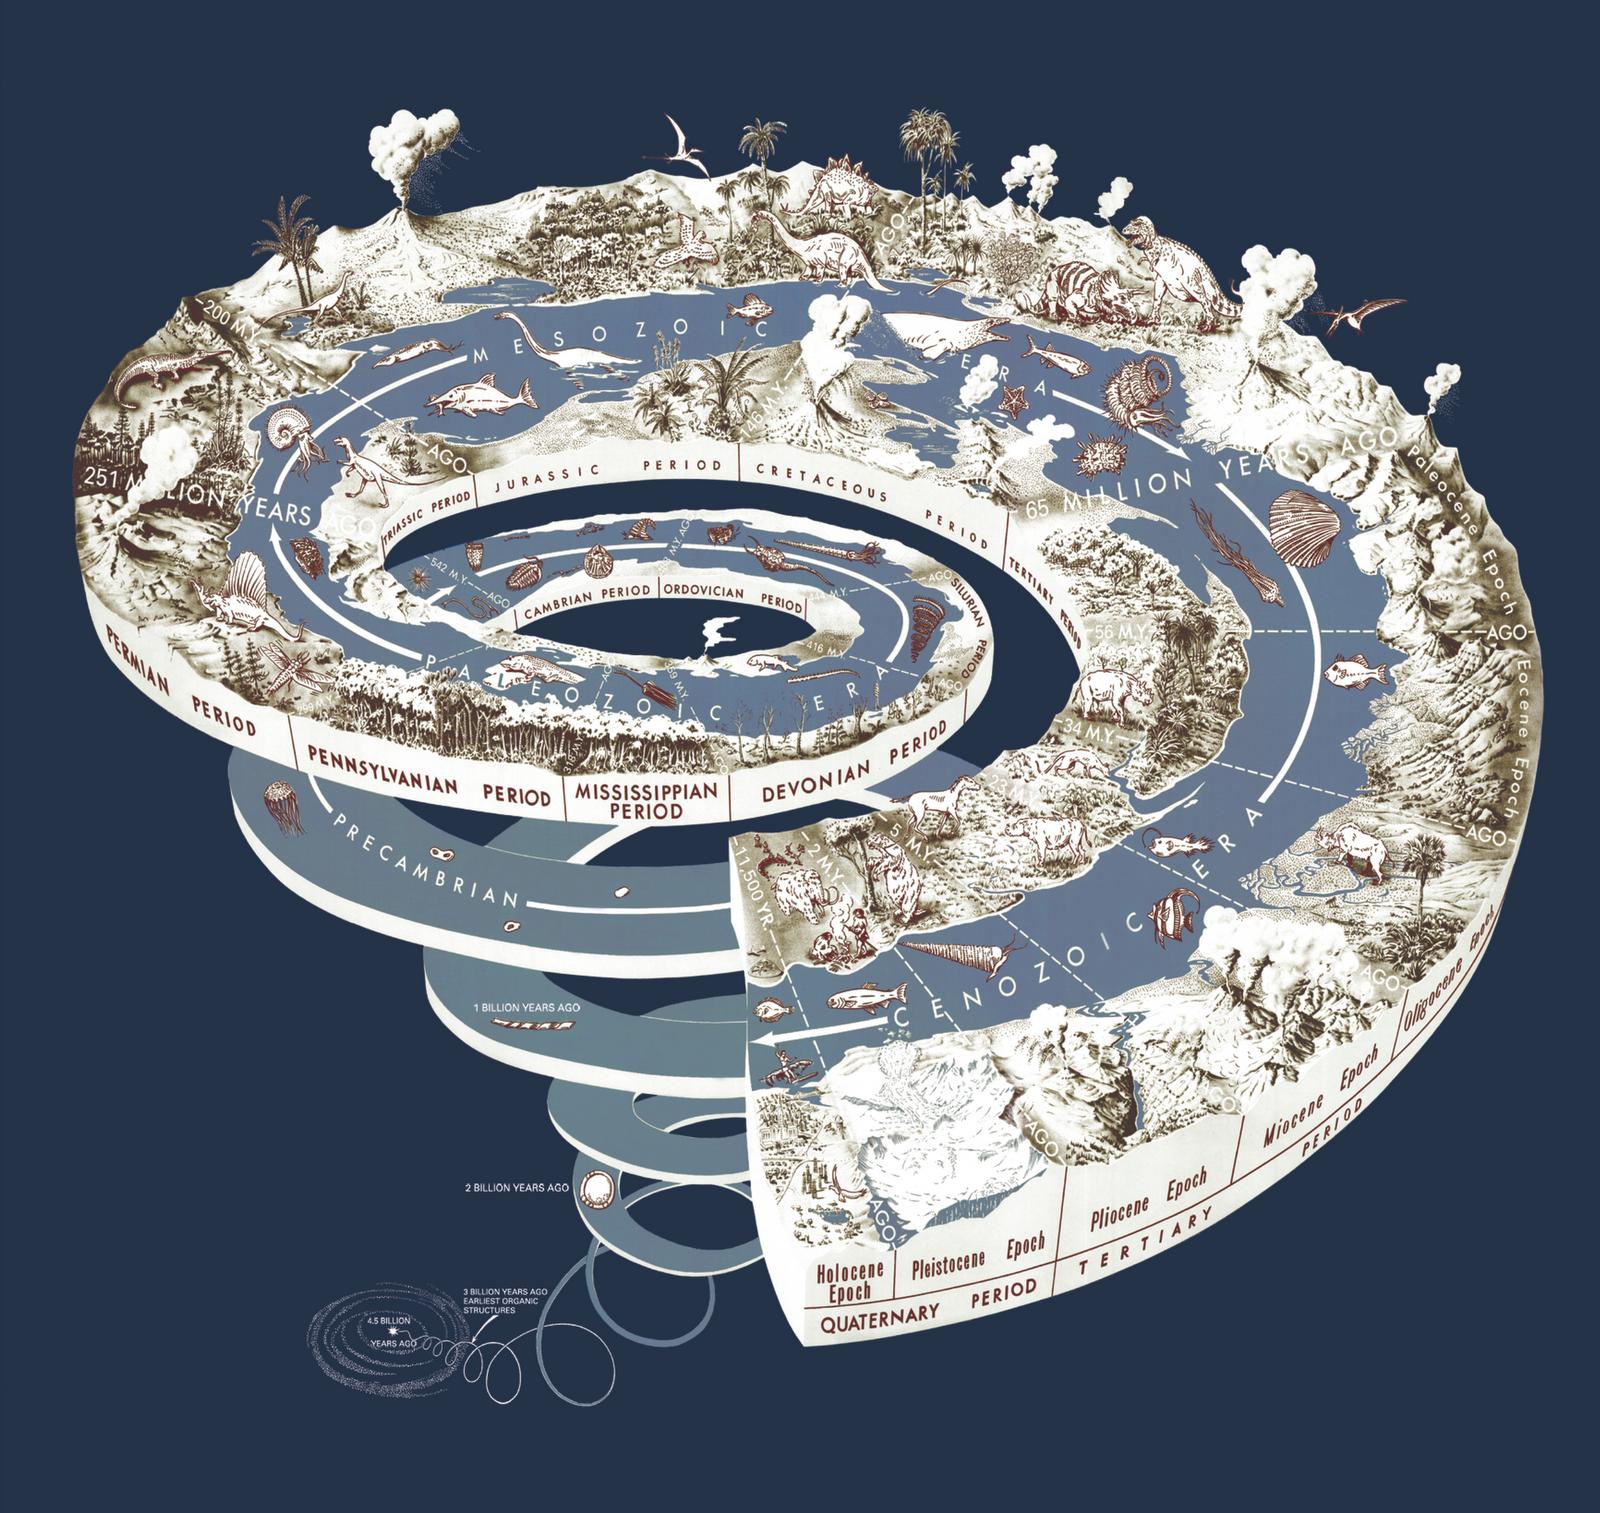 Quale era geologica per l'uomo contemporaneo?